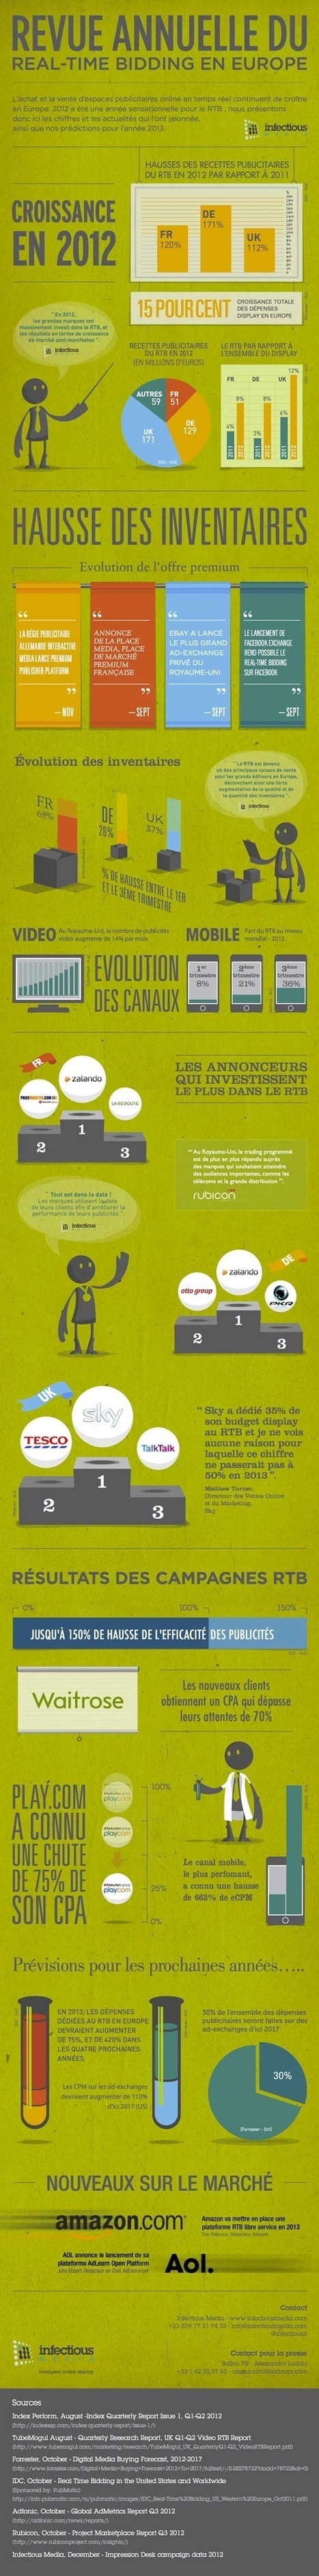 infographic | My digital news | Scoop.it